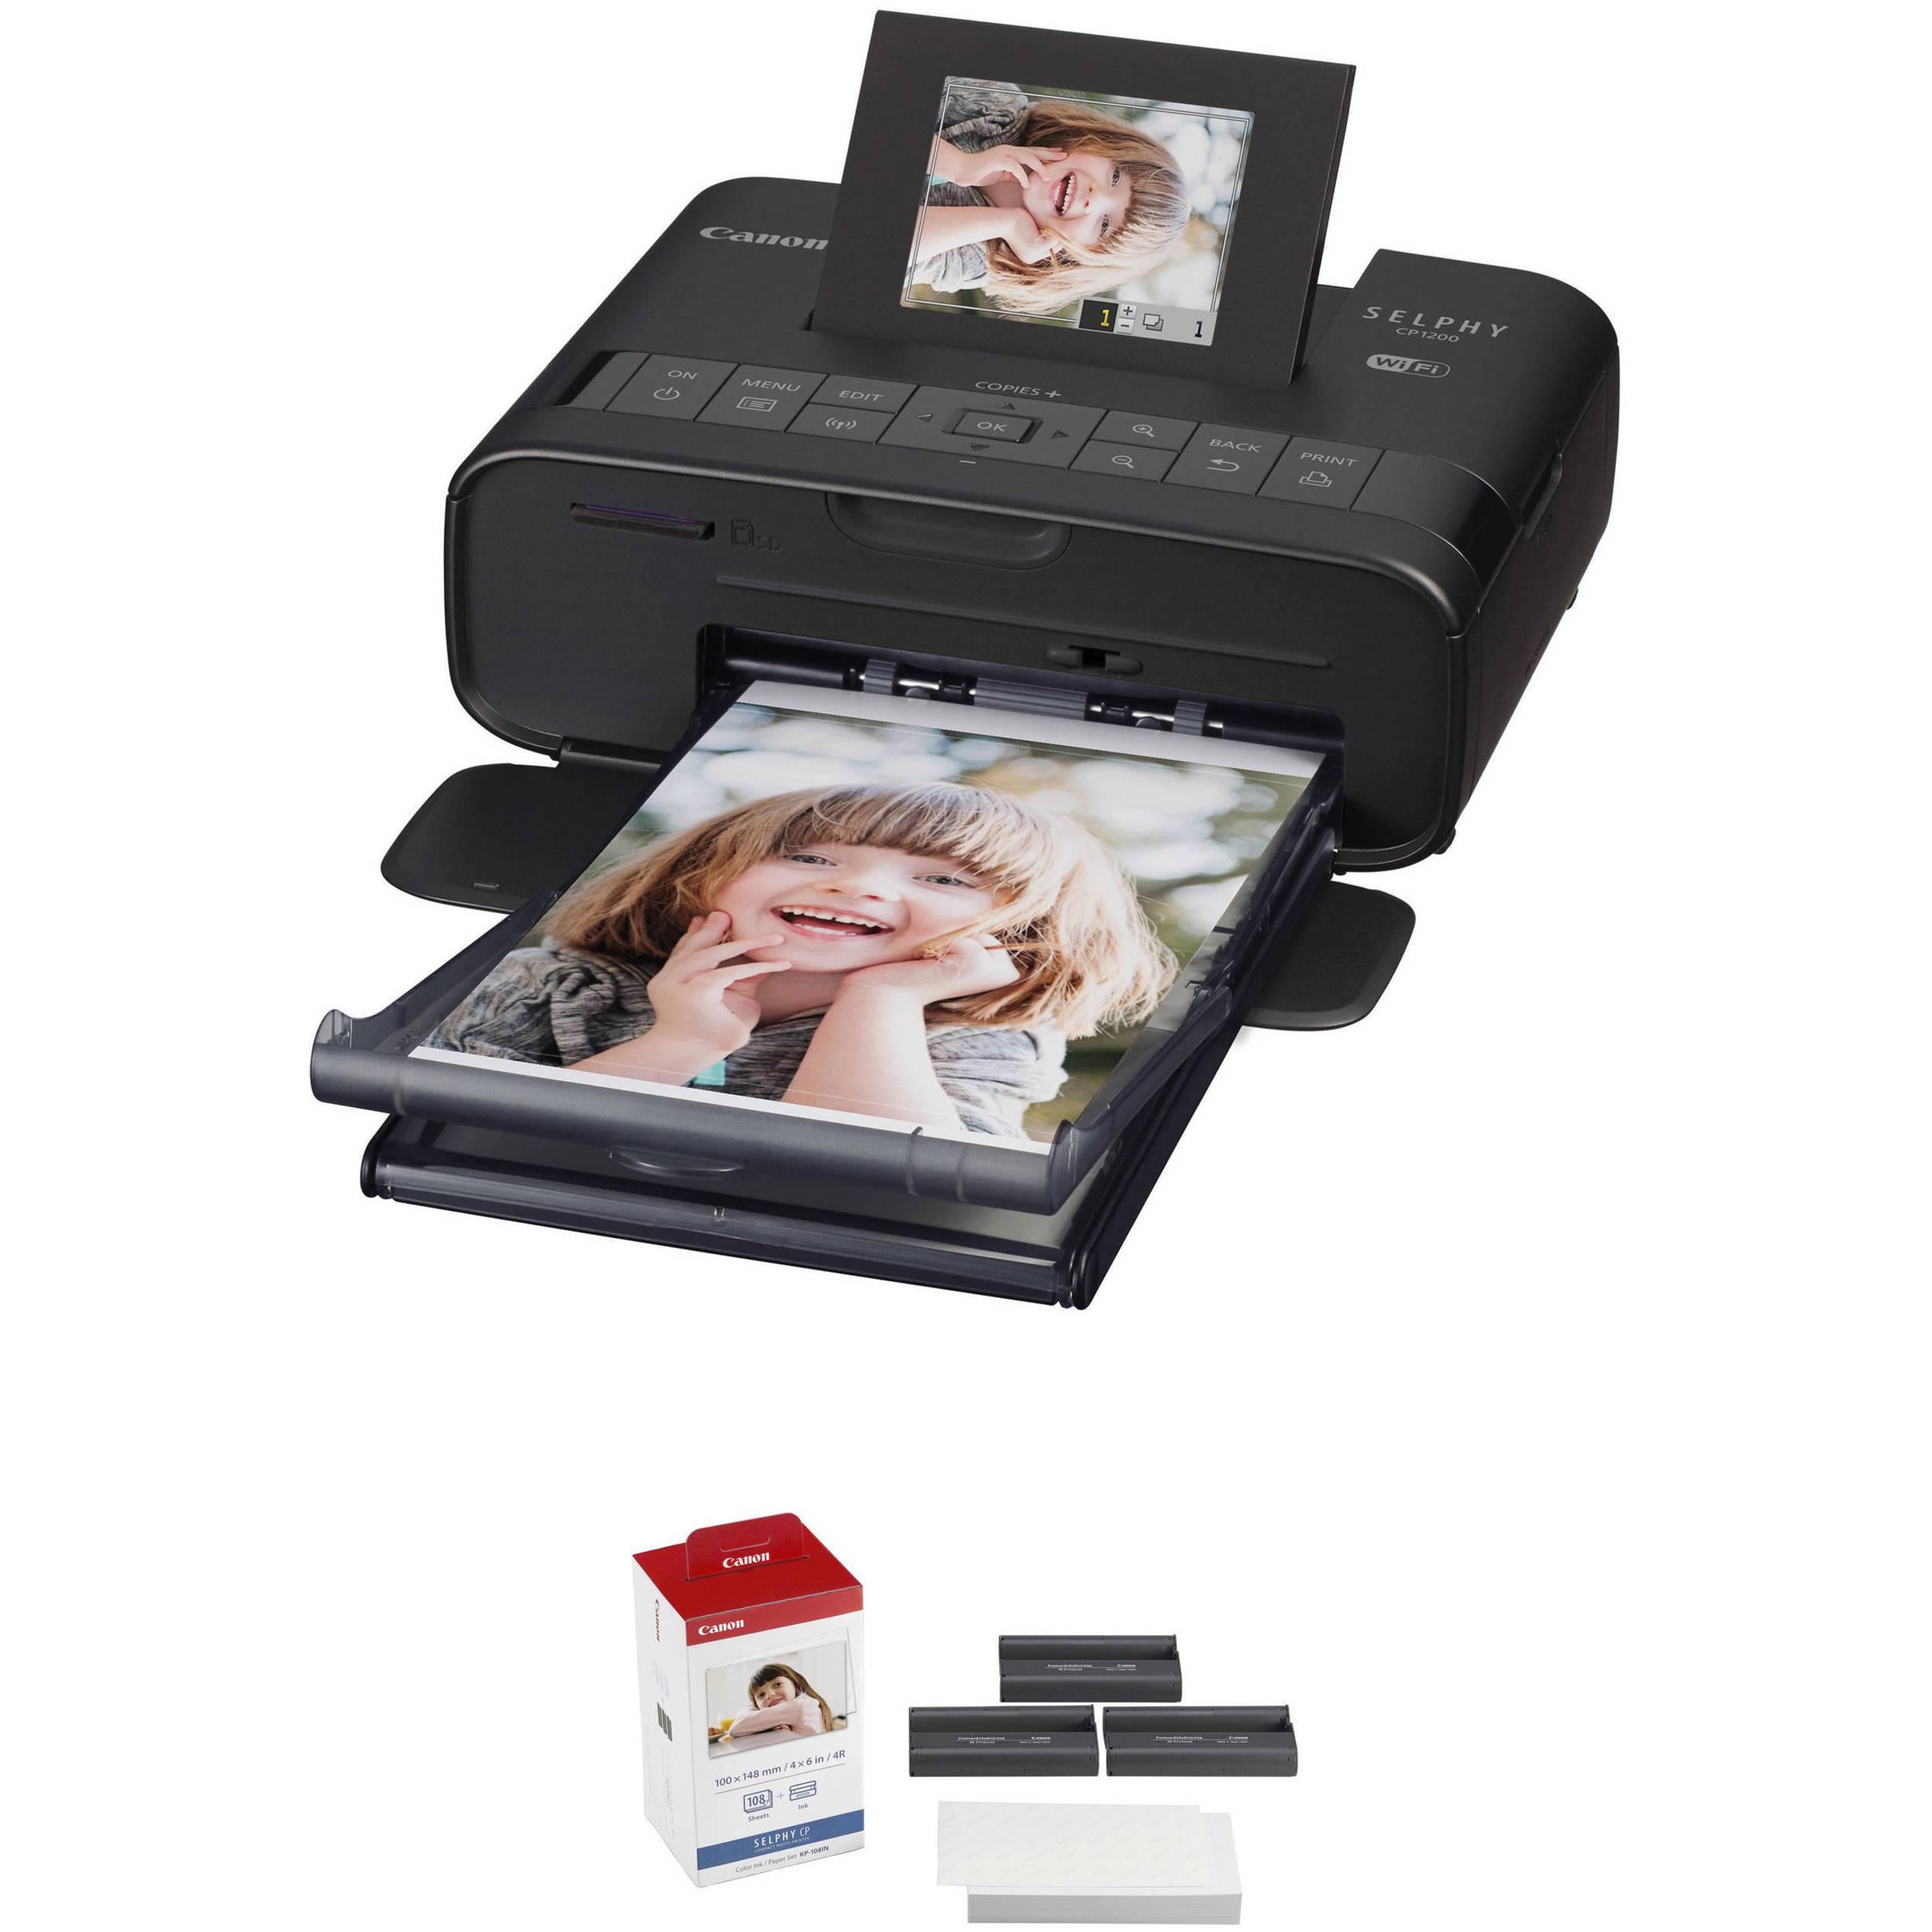 Canon SELPHY CP1200 Wireless Compact Photo Printer BampH Photo